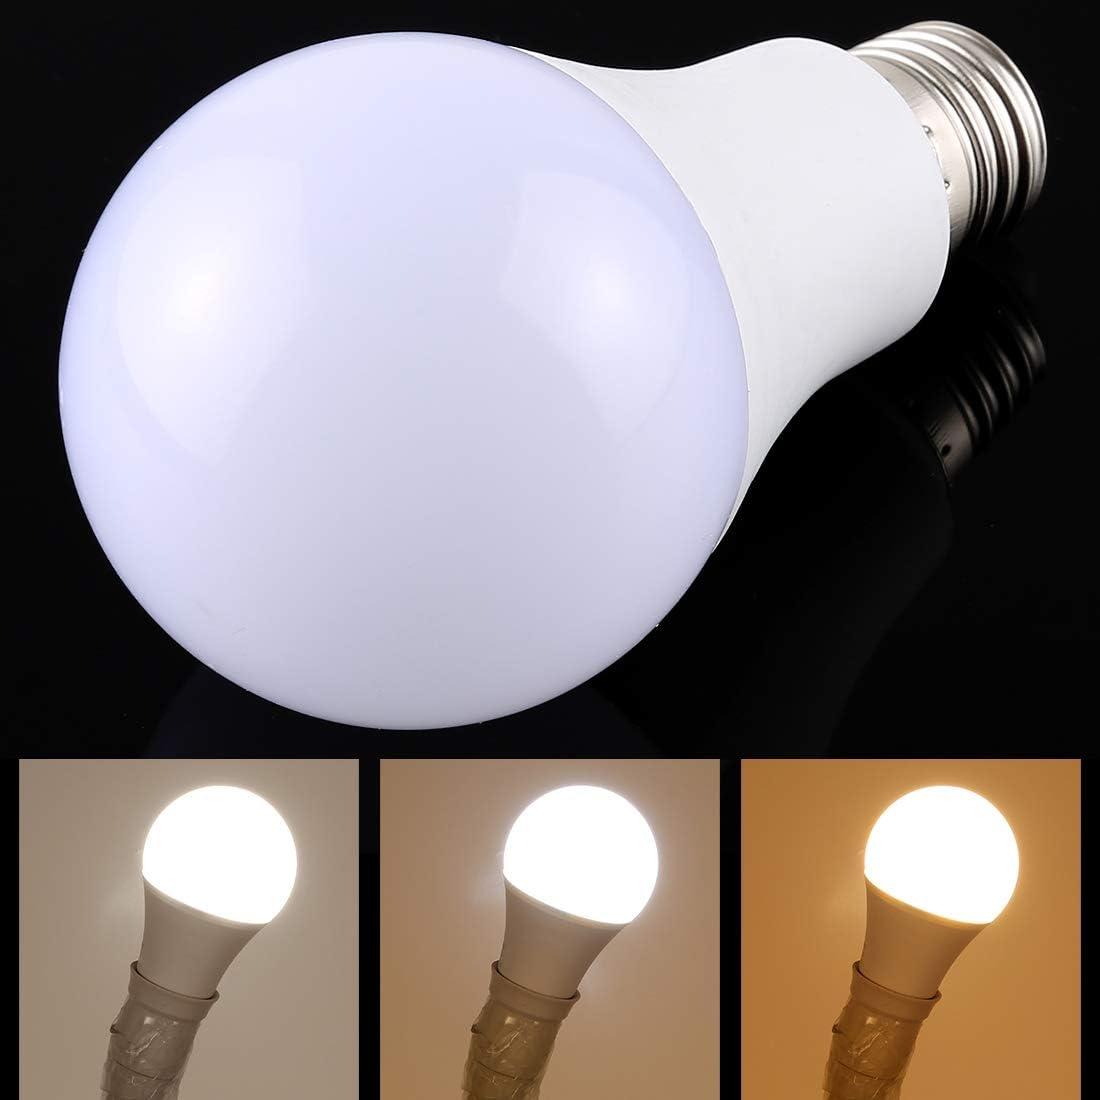 AC 85-250V Simas Denim LED Bulbs B22//E27 7W 250-600LM Intelligent LED Bulb Energy Saving Light with Three Color Temperature